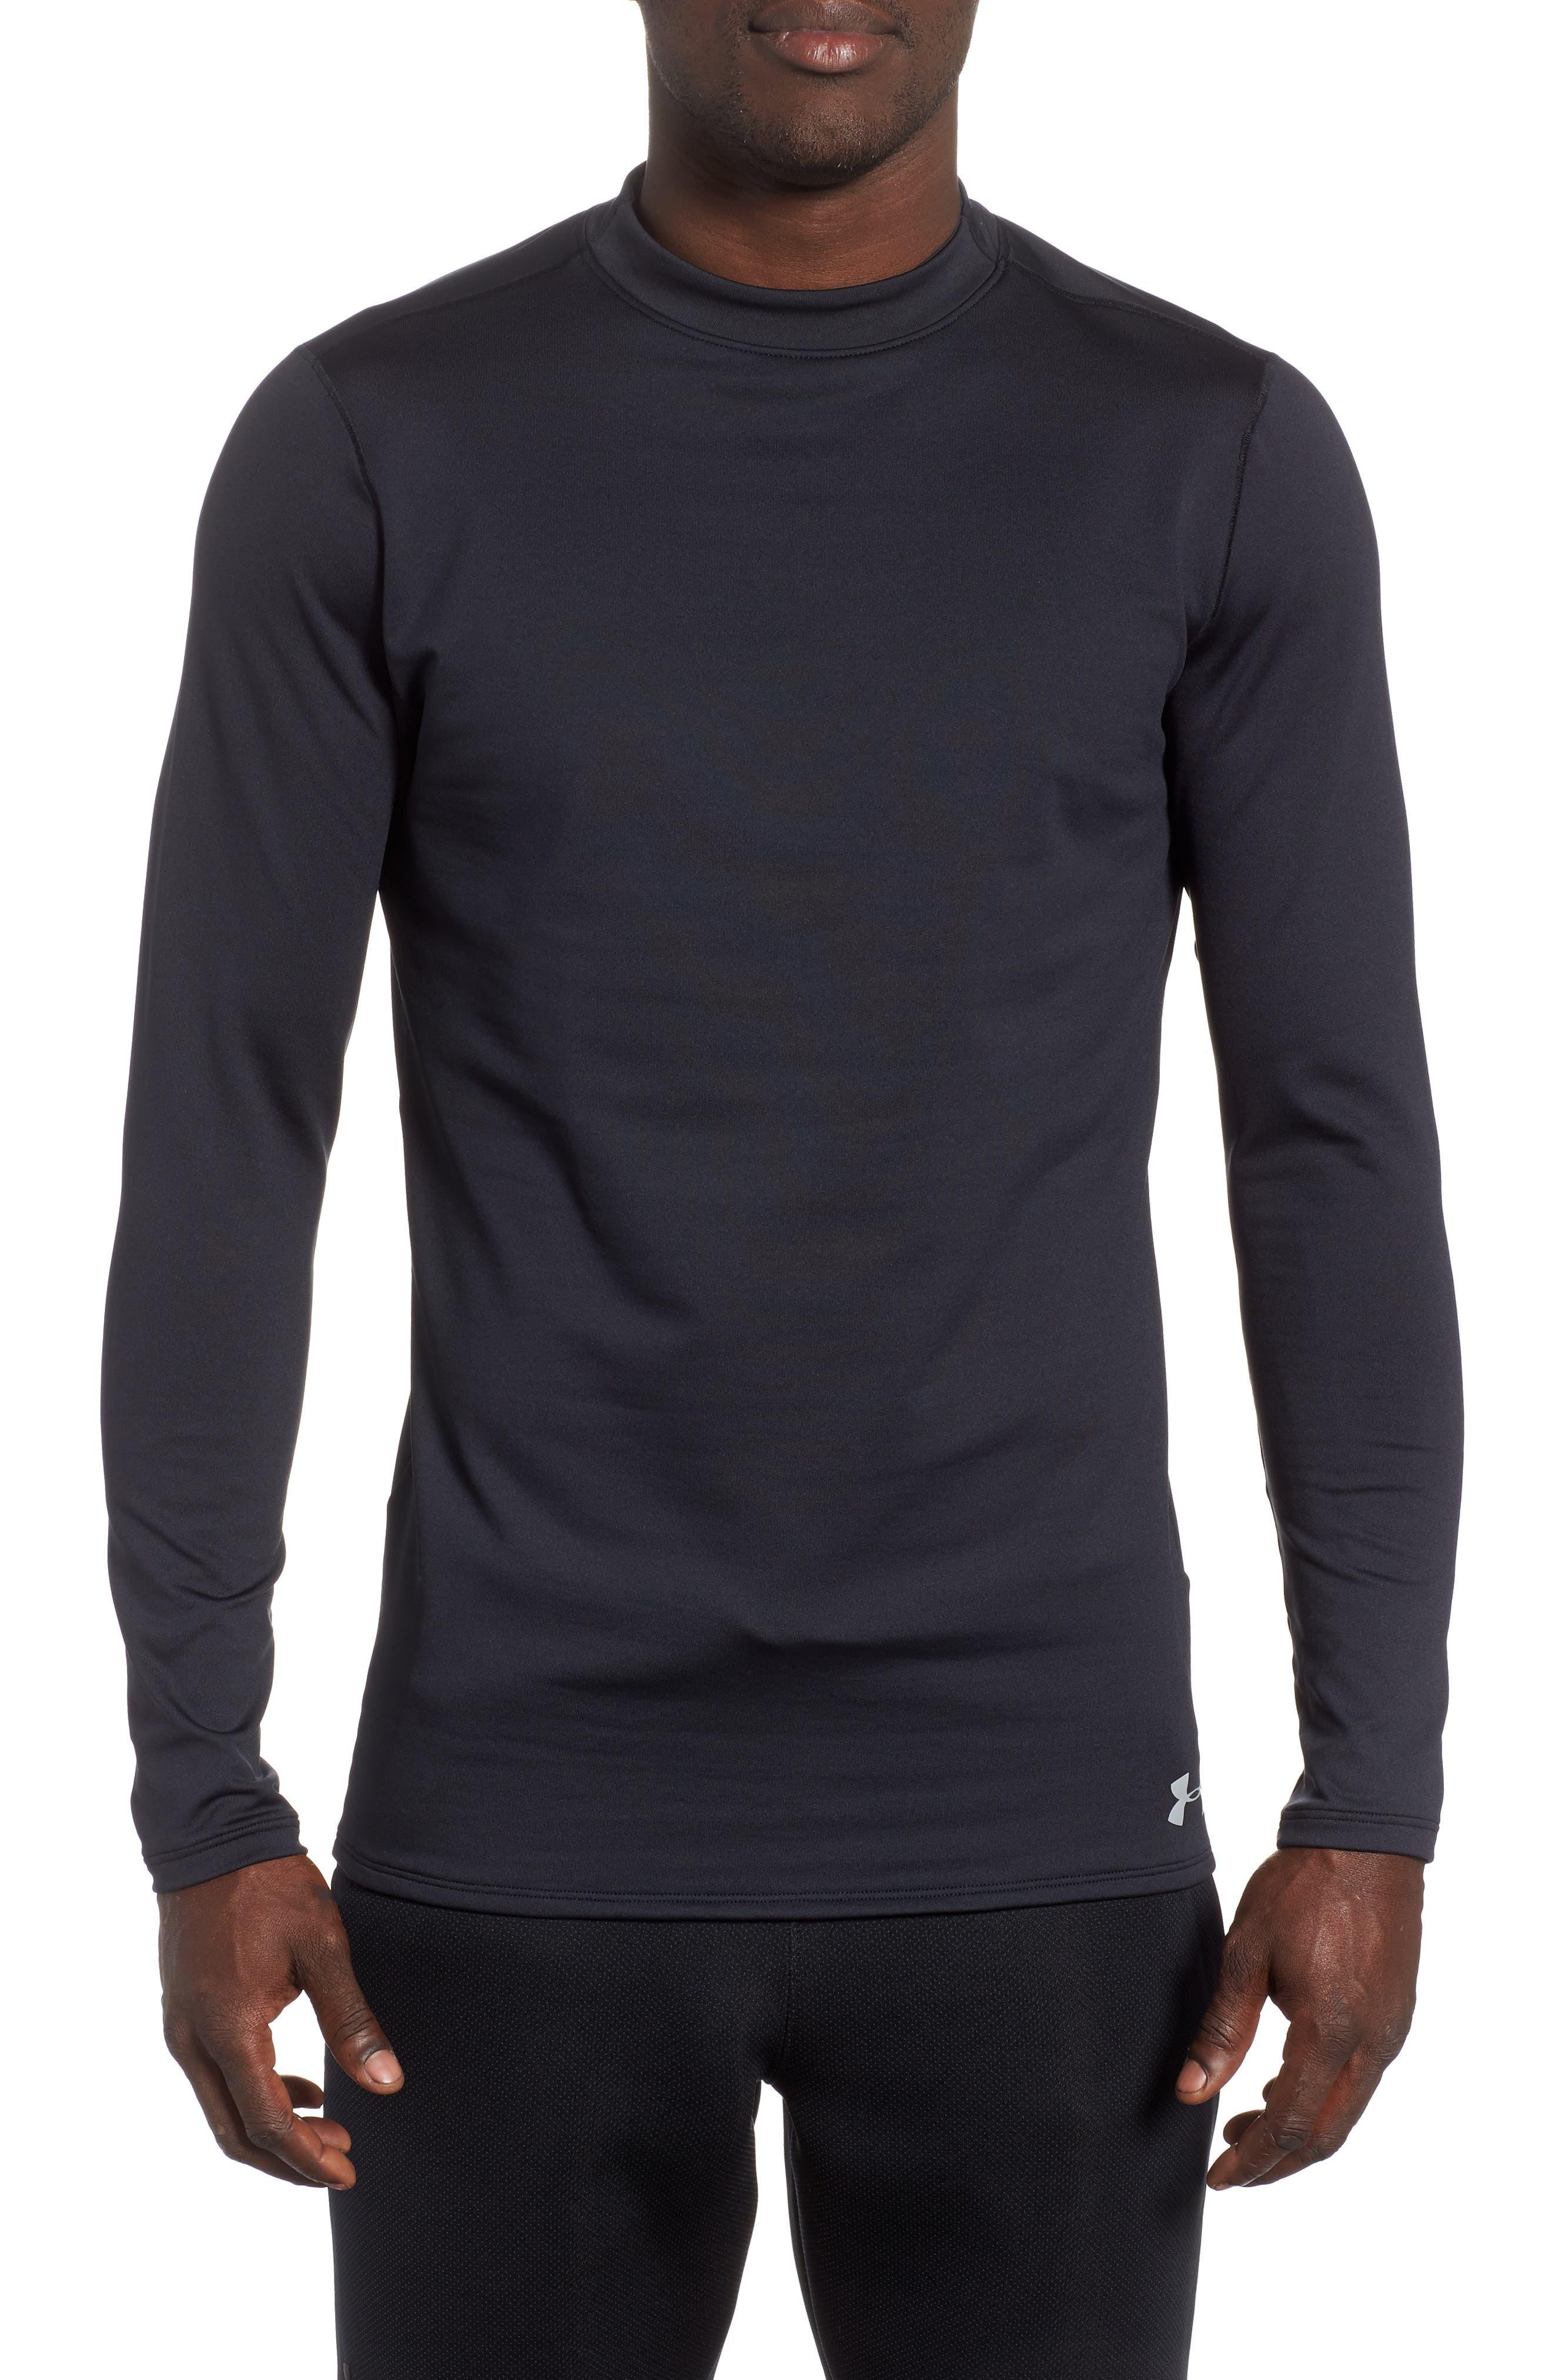 Under Armour Coldgear Mock Neck Long Sleeve T-Shirt